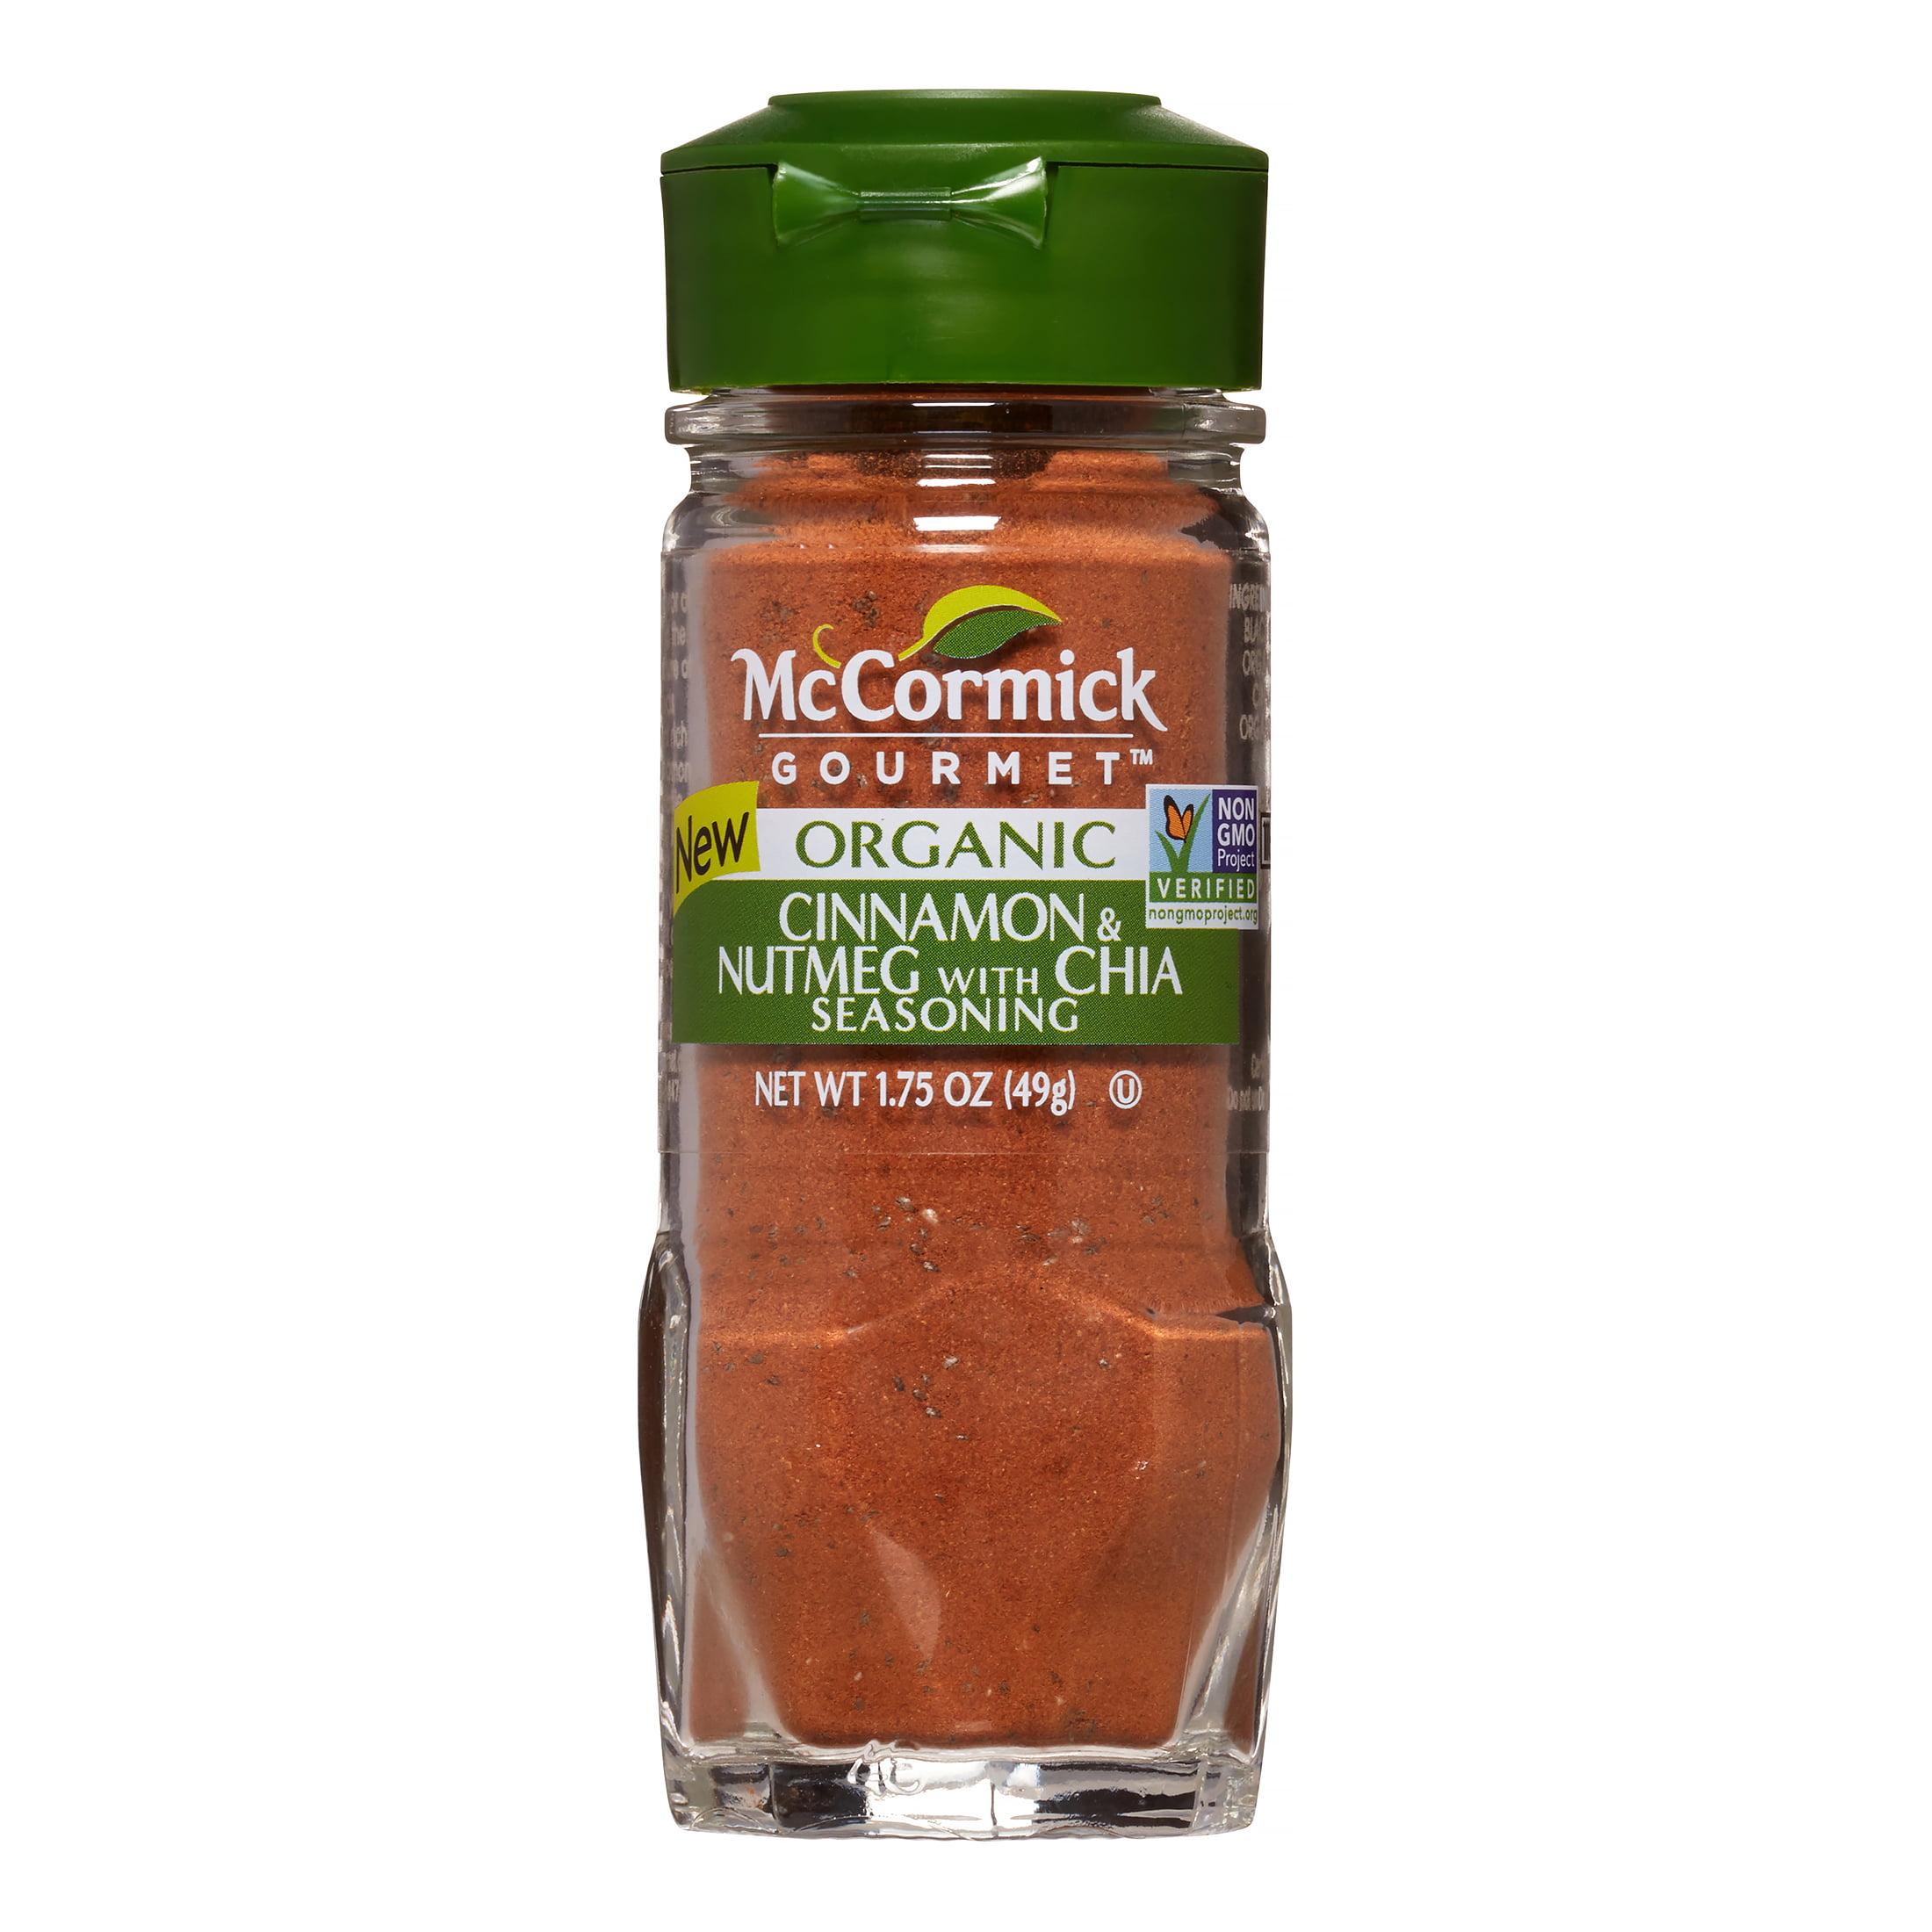 McCormick Gourmet Organic Cinnamon & Nutmeg with Chia, 1.75 oz. Shaker by Mccormick